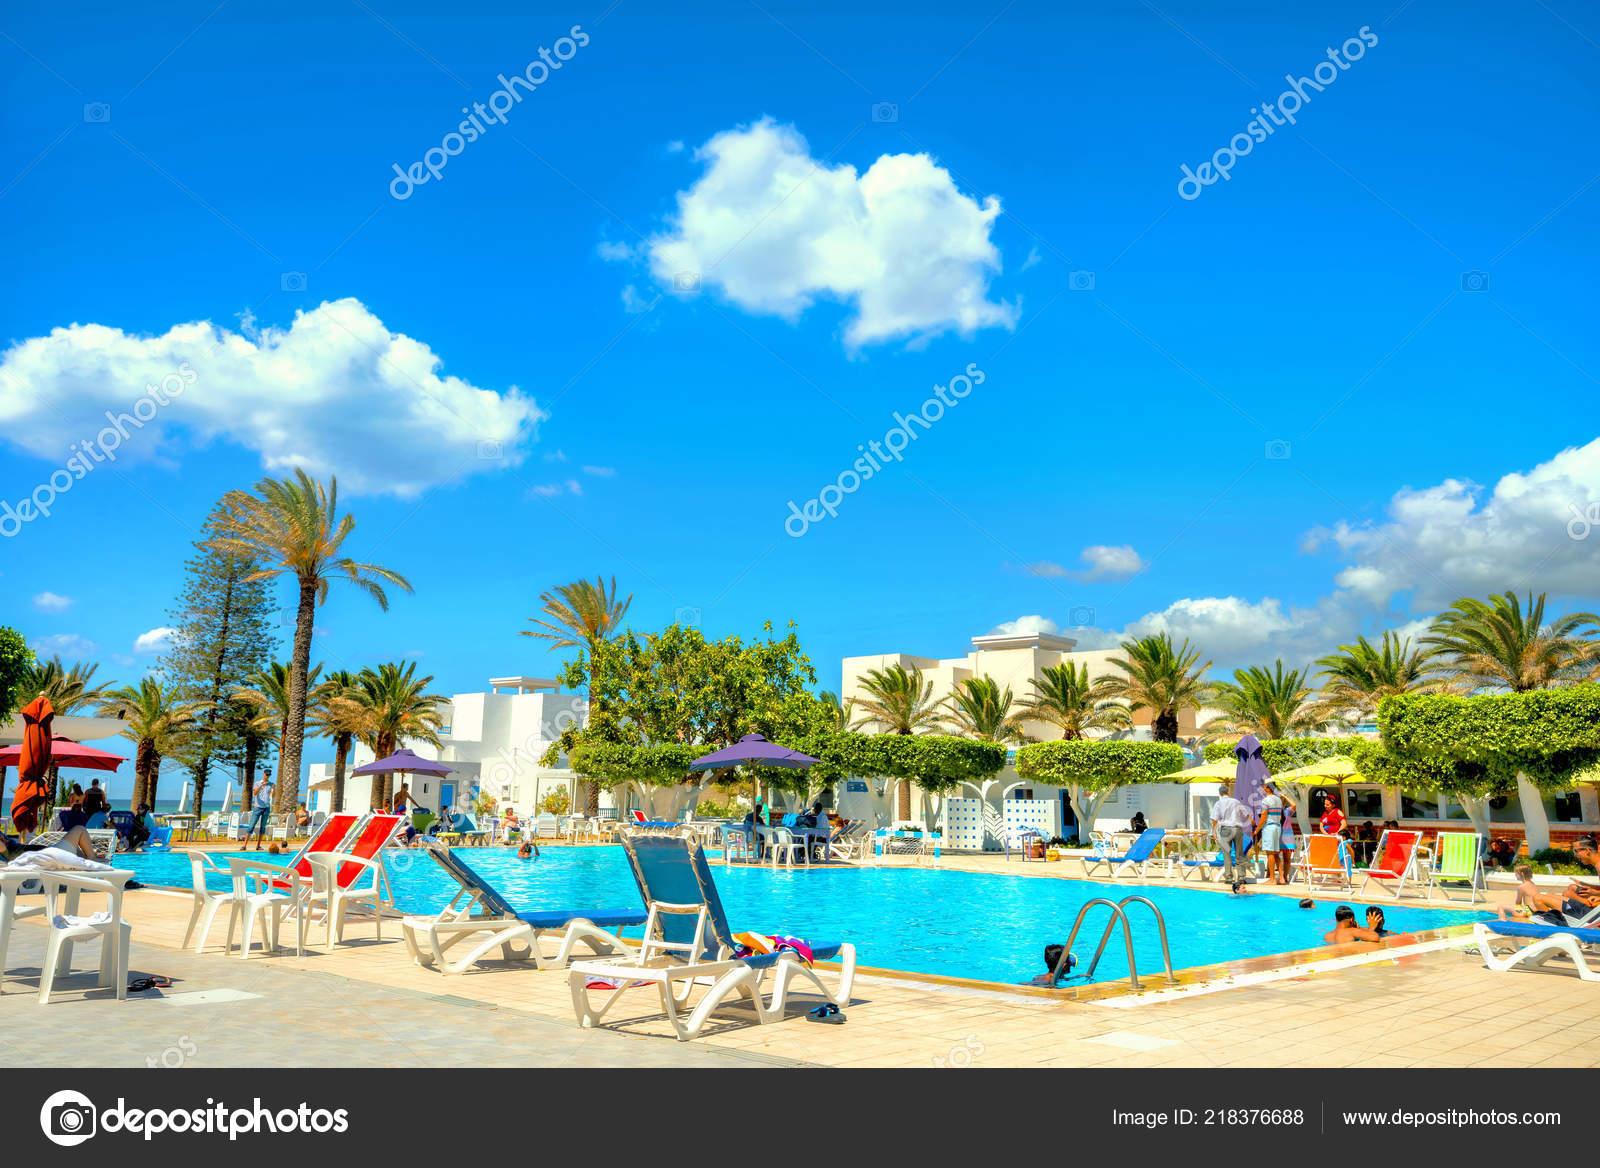 Nabeul Tunisia July 2017 Courtyard Swimming Pool Resort ...